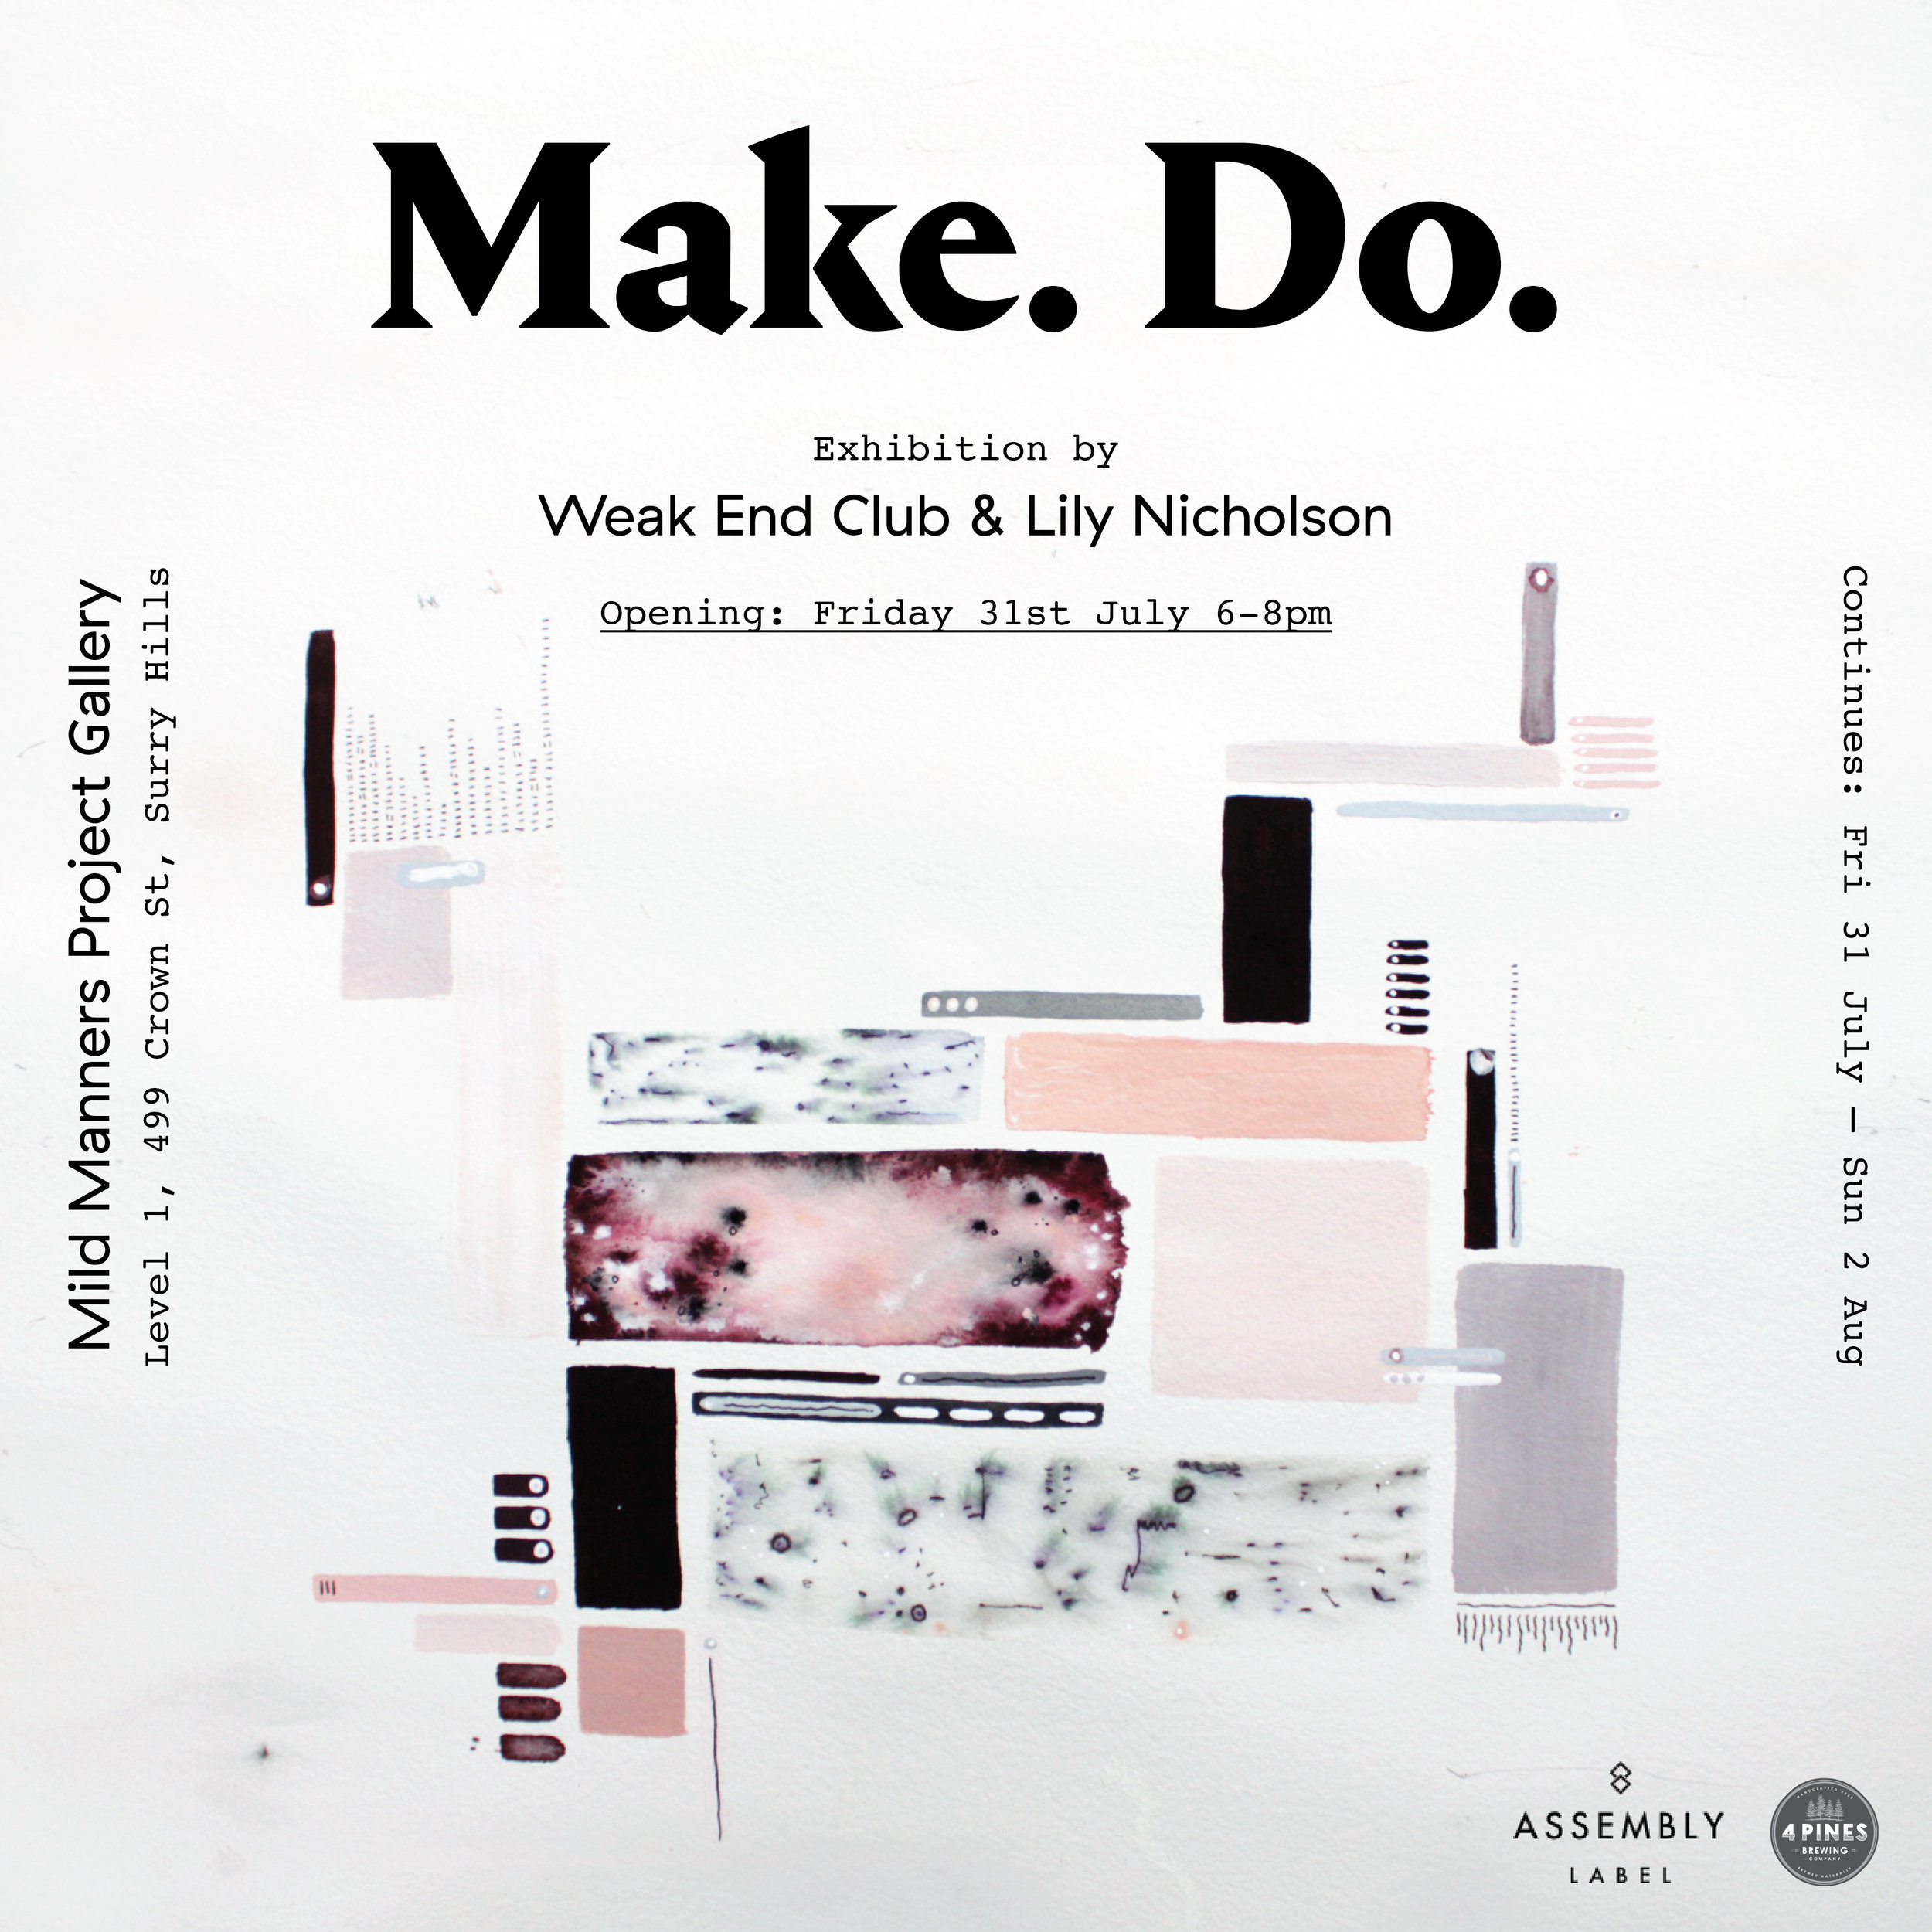 Make.Do_Instagram Event Image_Lily.jpg